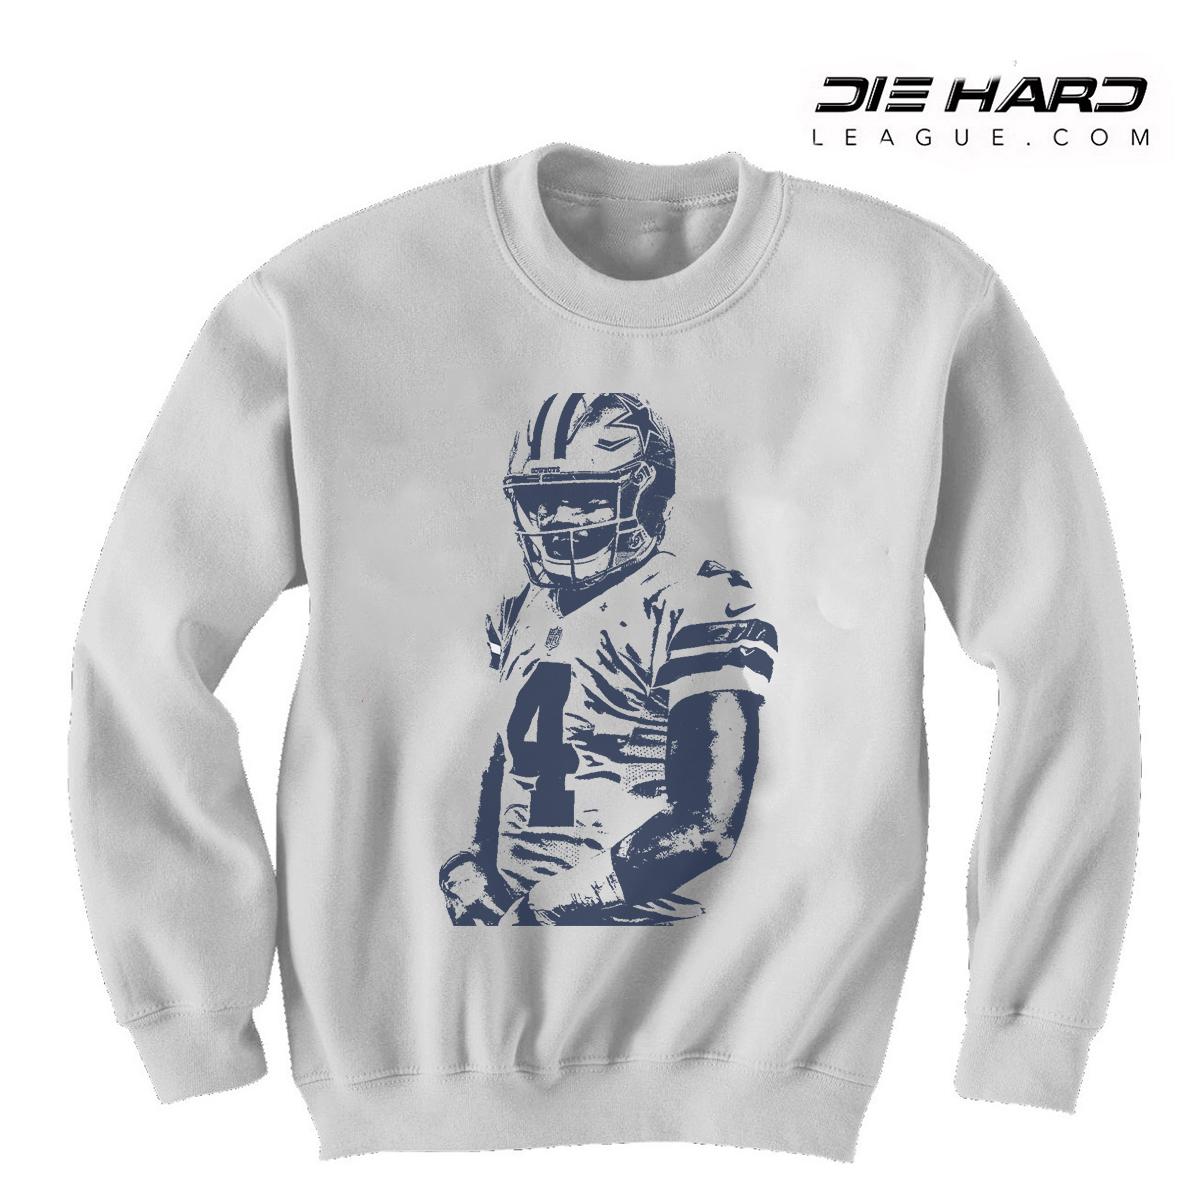 low priced ab365 6f84f Dallas Cowboy Sweatshirt - Dak Prescott Sweater White